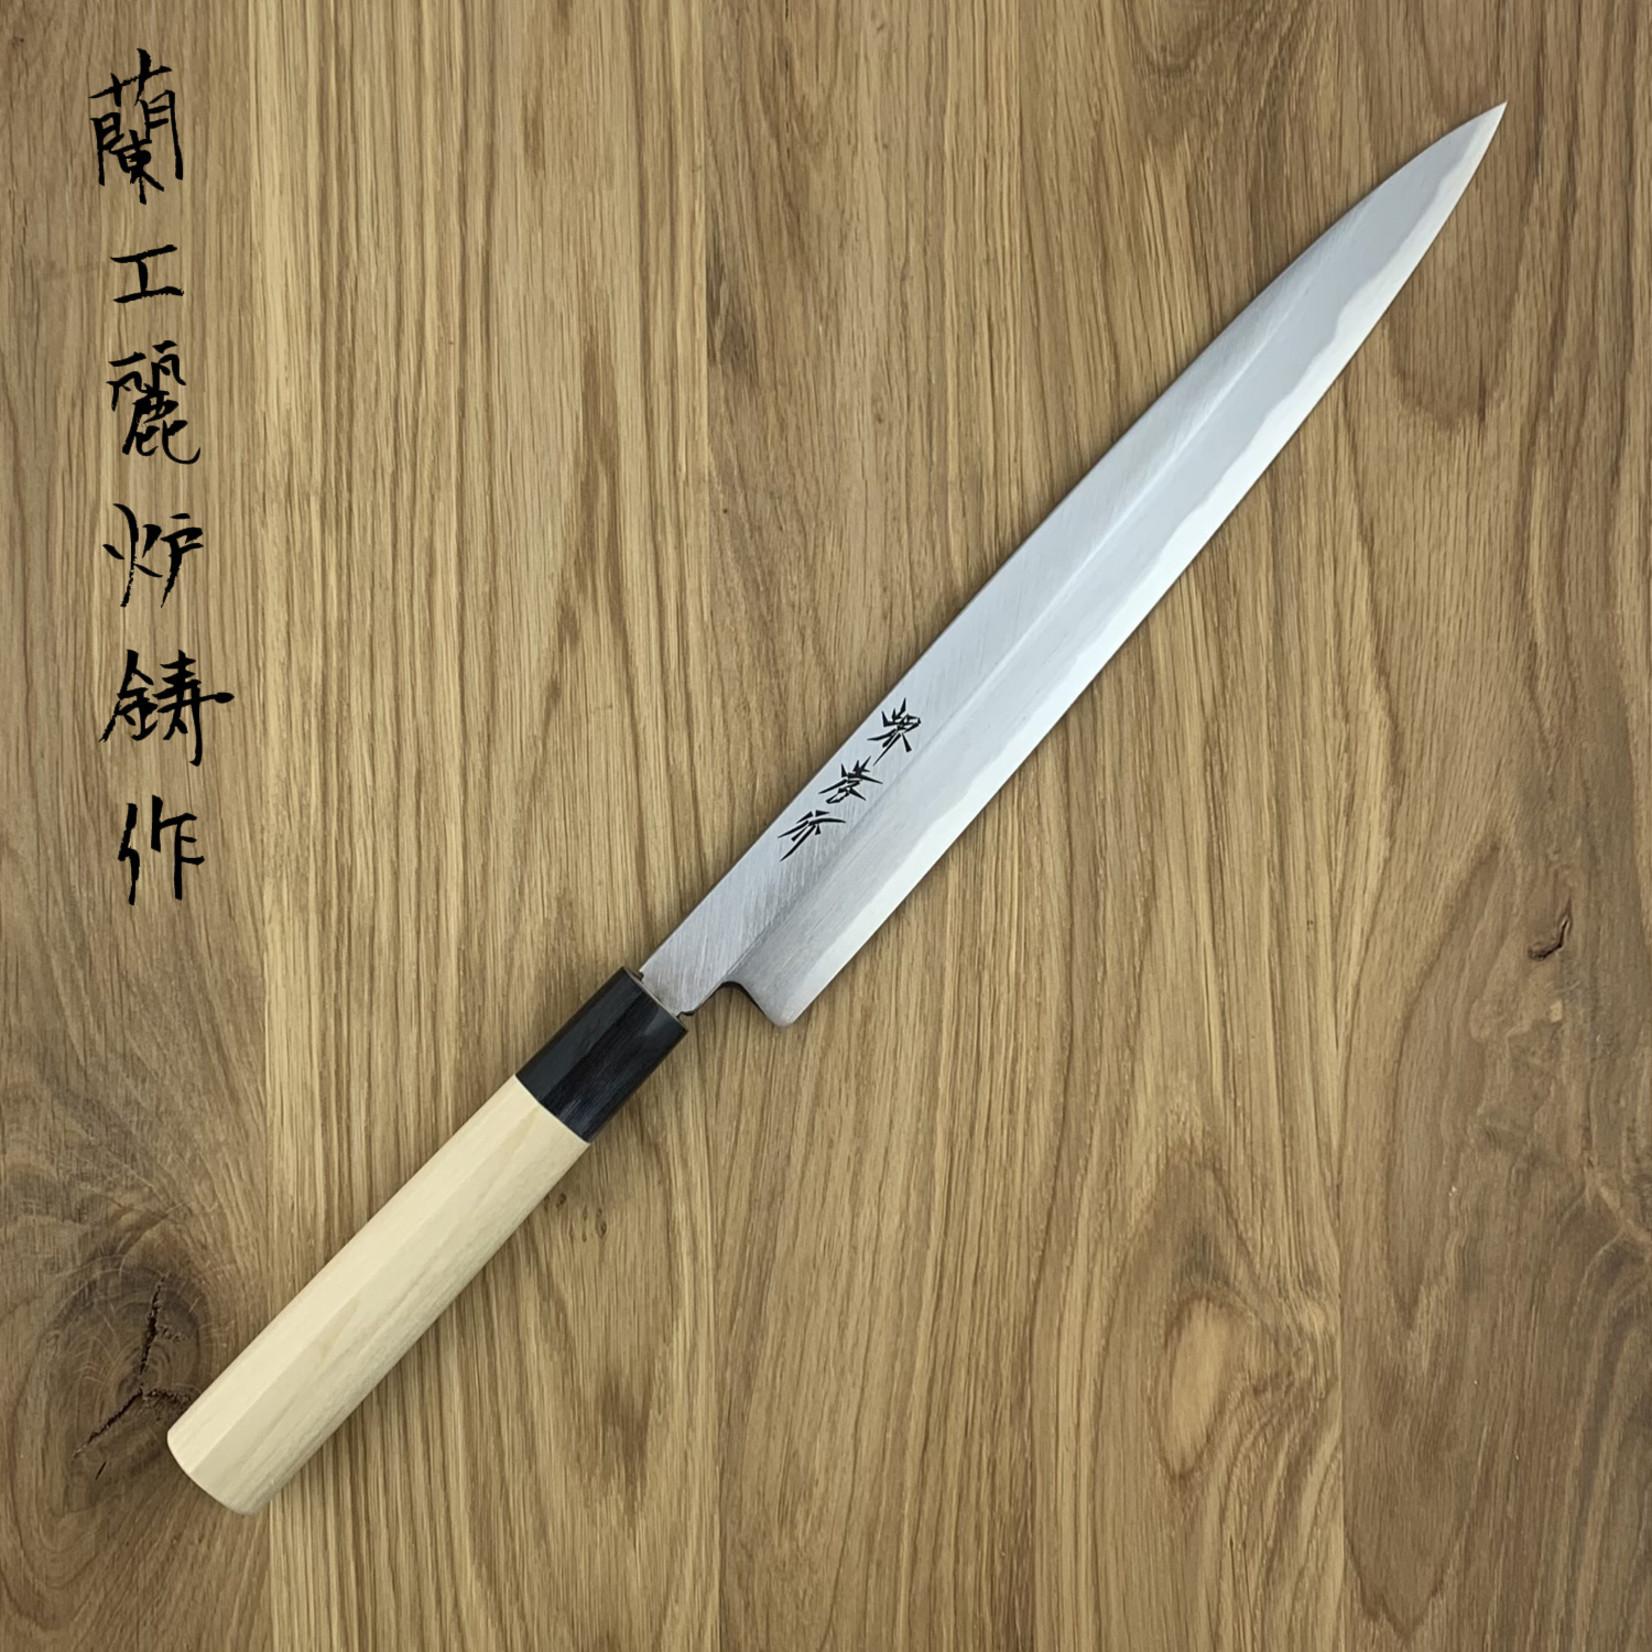 SAKAI TAKAYUKI Kasumi Suigyu White #3 Magnolia Heft Yanagiba 270 mm 06304